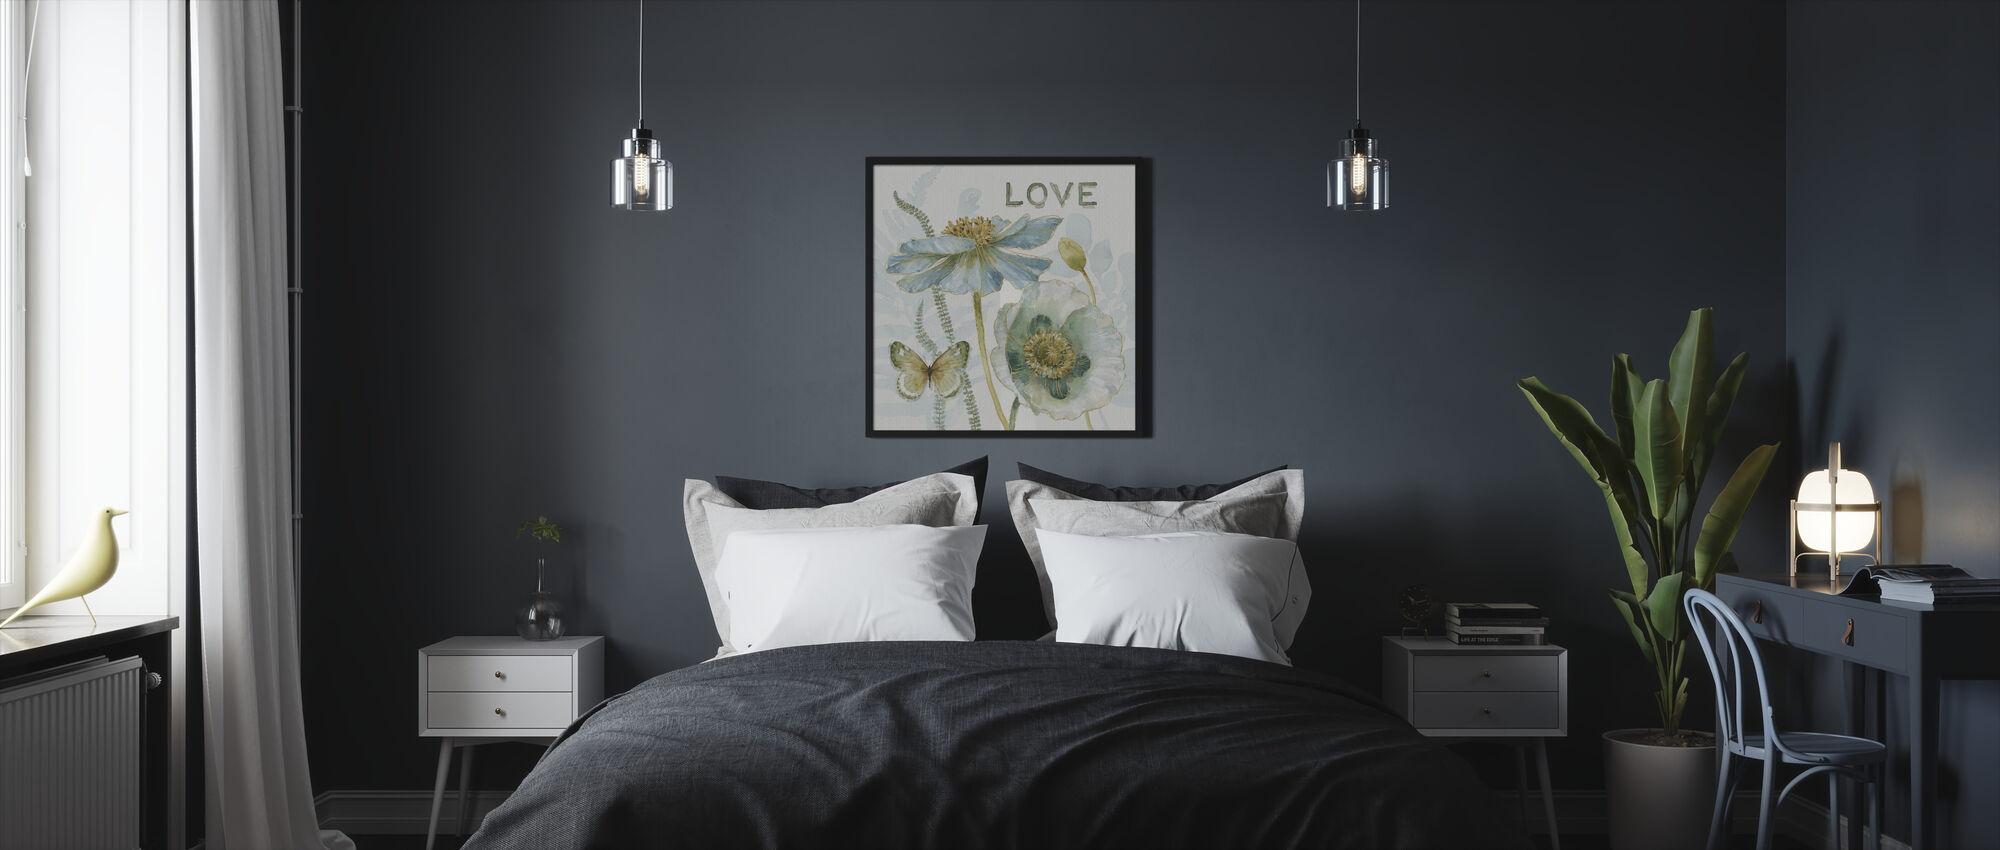 My Greenhouse Flowers - Love - Framed print - Bedroom